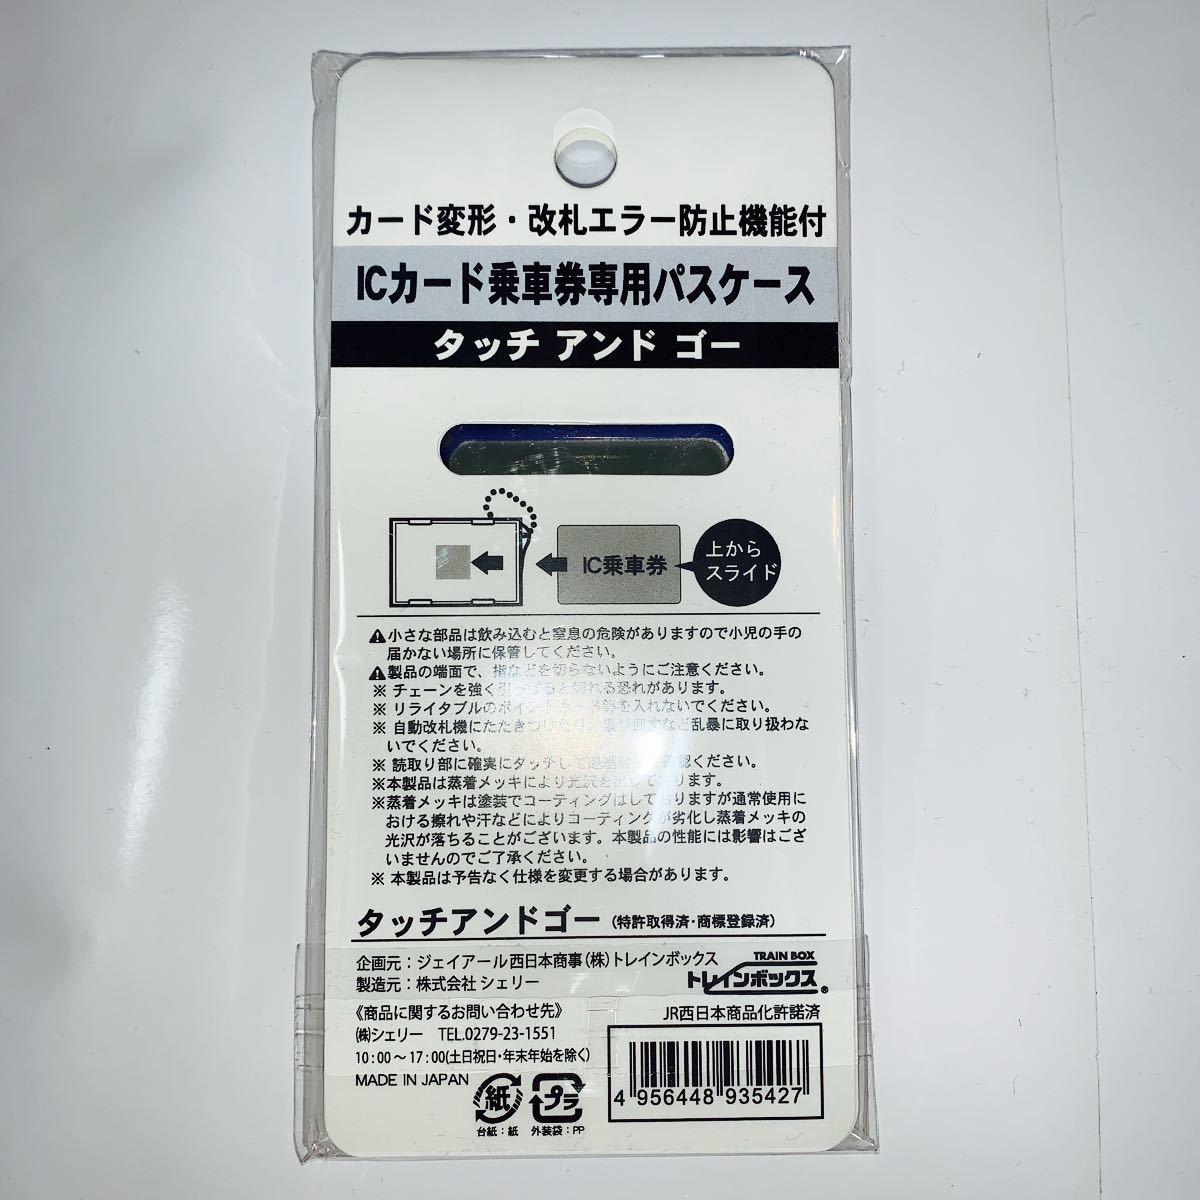 JR西日本 ICカード乗車券専用パスケース 新幹線